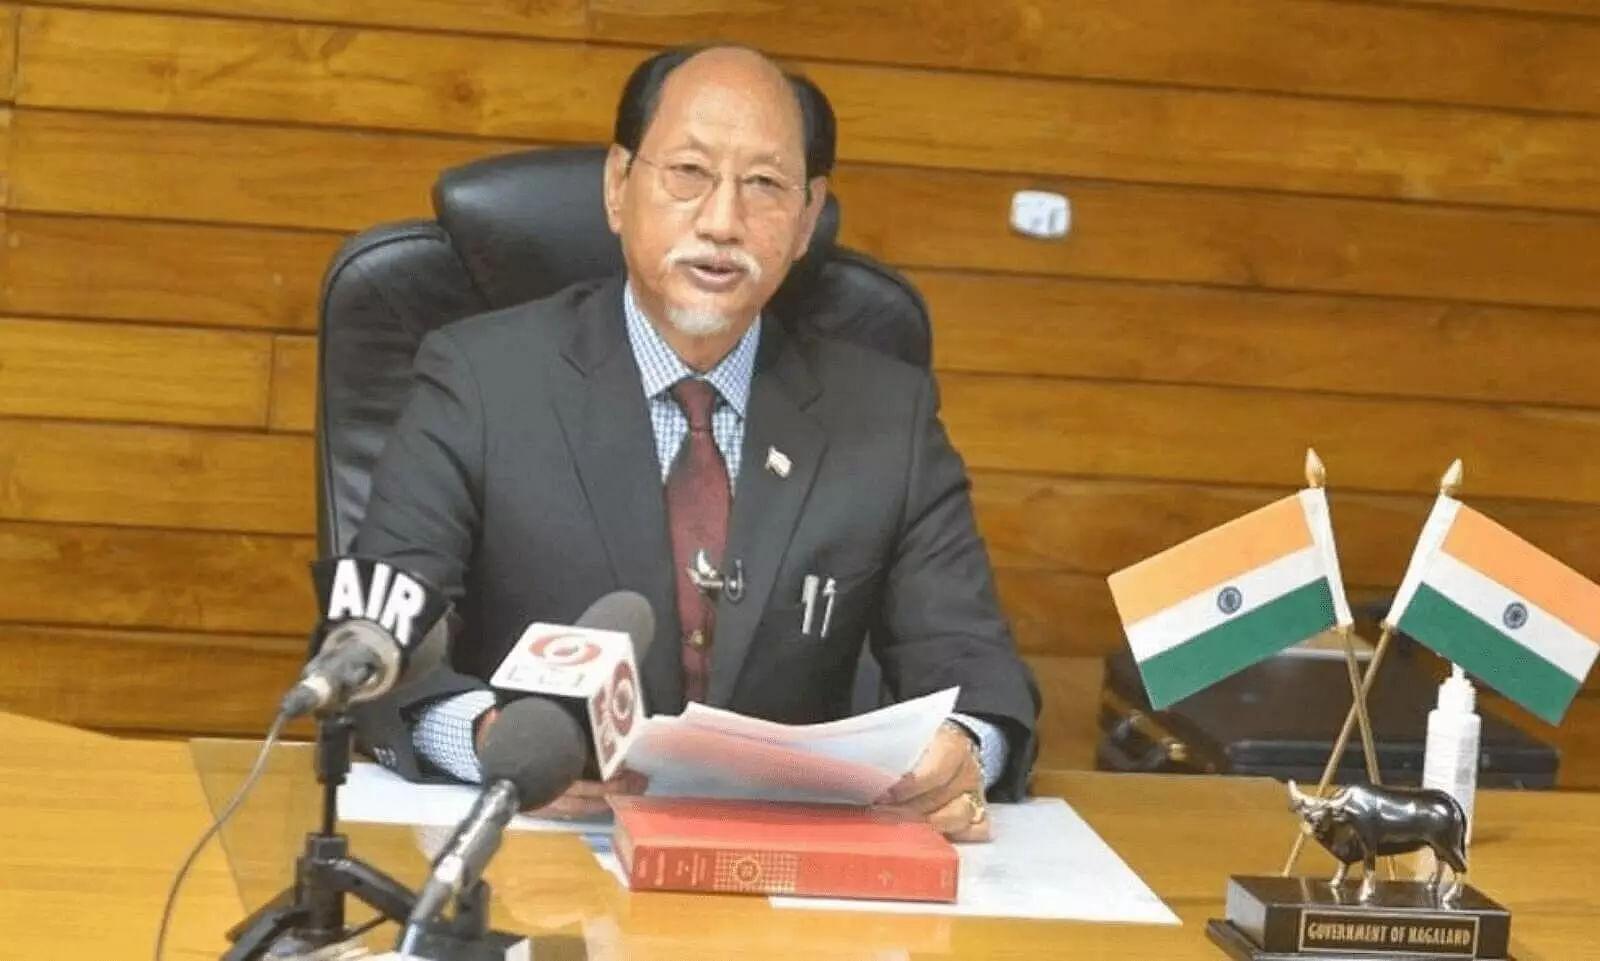 14-Days Institutional Quarantine Mandatory for all Nagaland Returnees: Govt